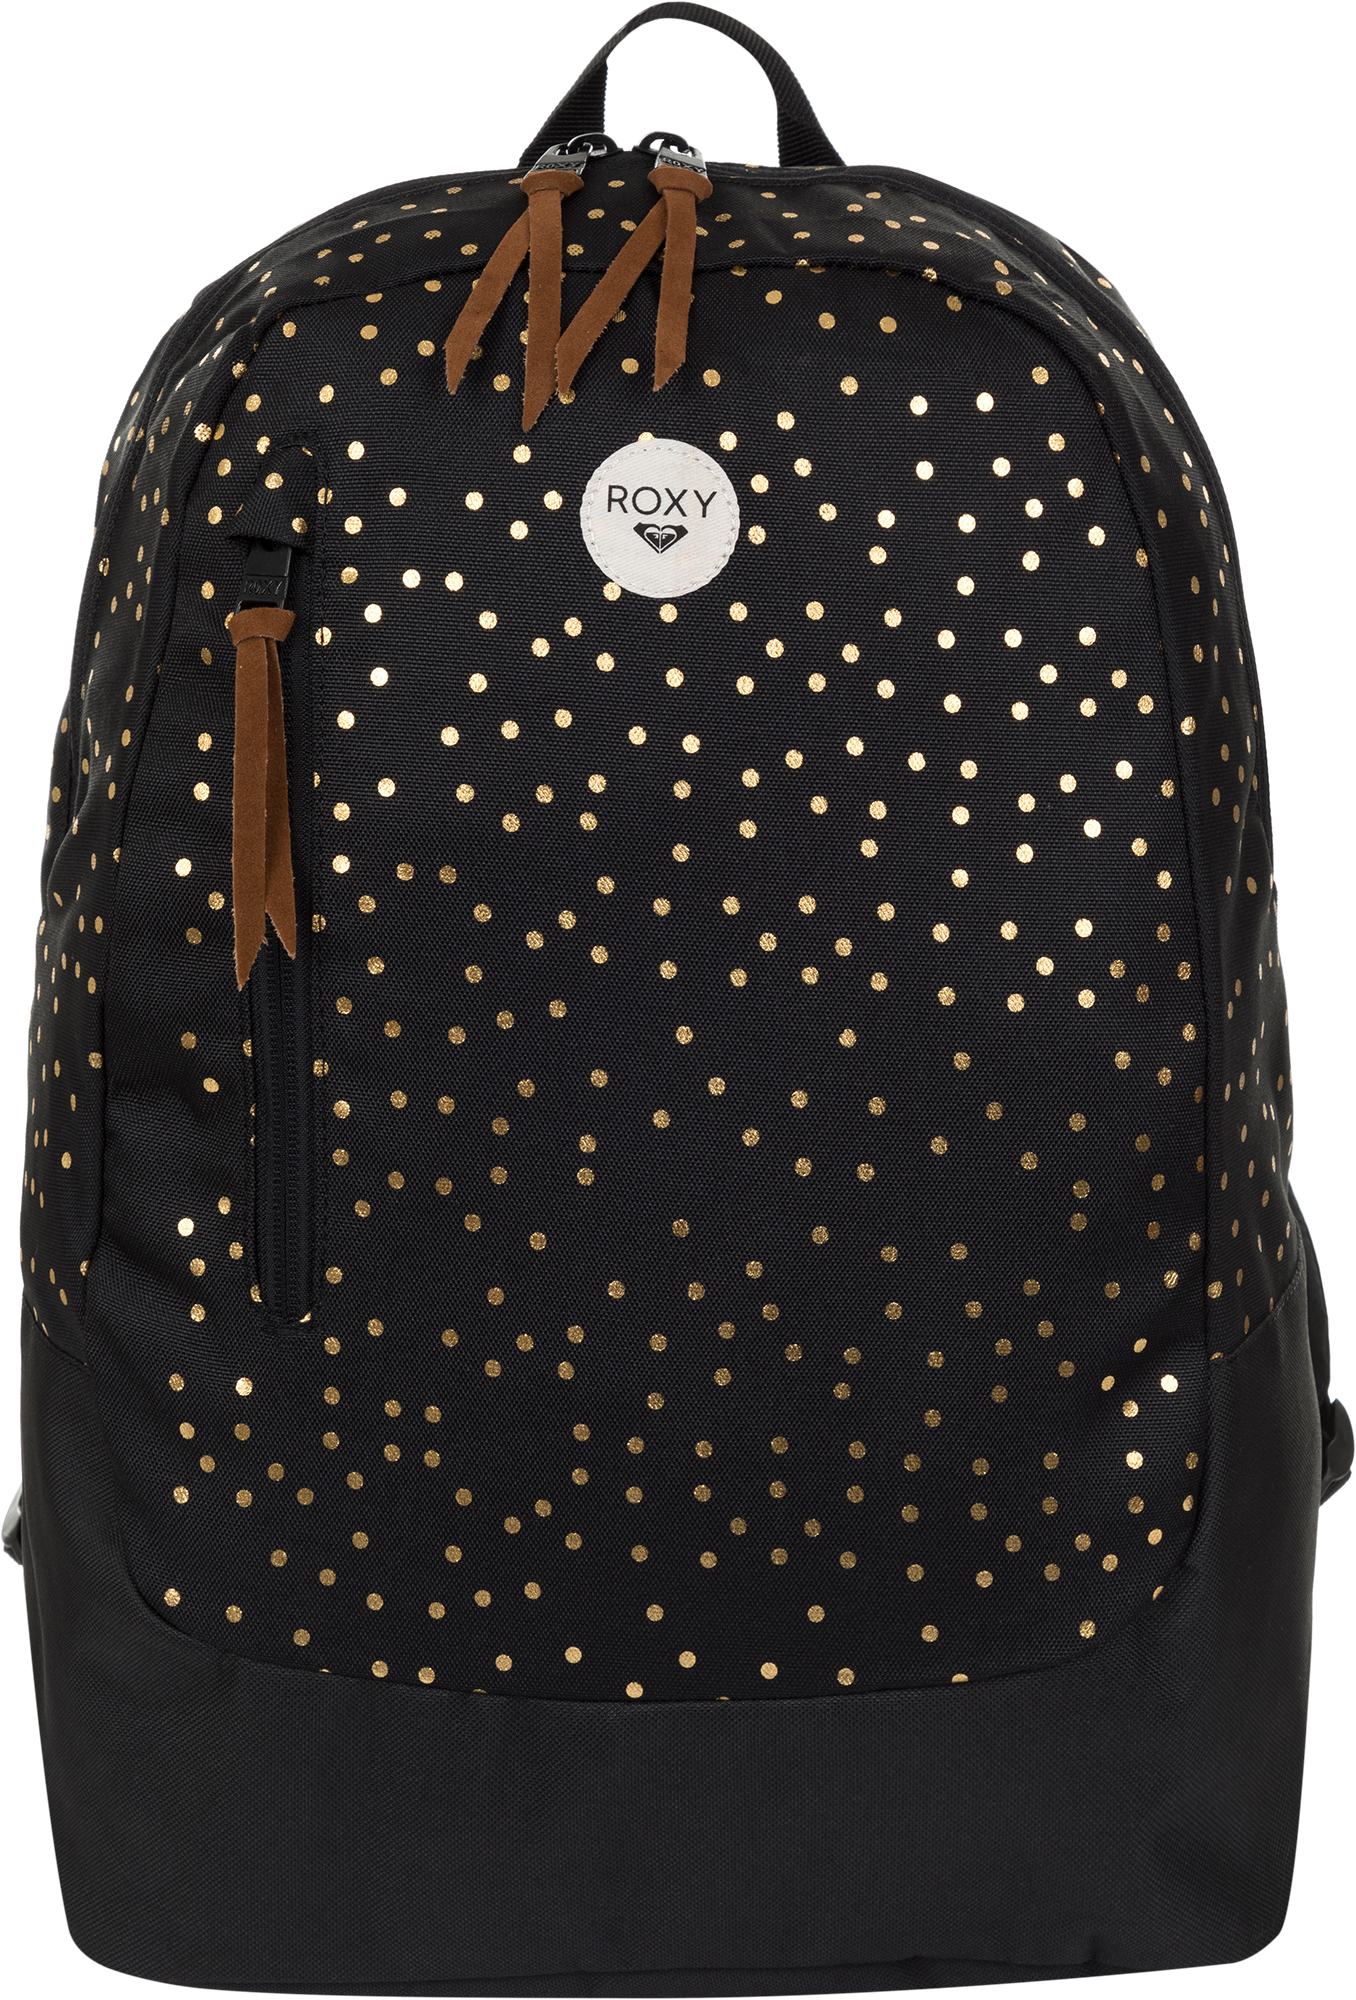 Roxy Рюкзак женский Roxy Primerose S Gold Dots, размер Без размера рюкзак городской женский roxy shadow swell dress blues small wi